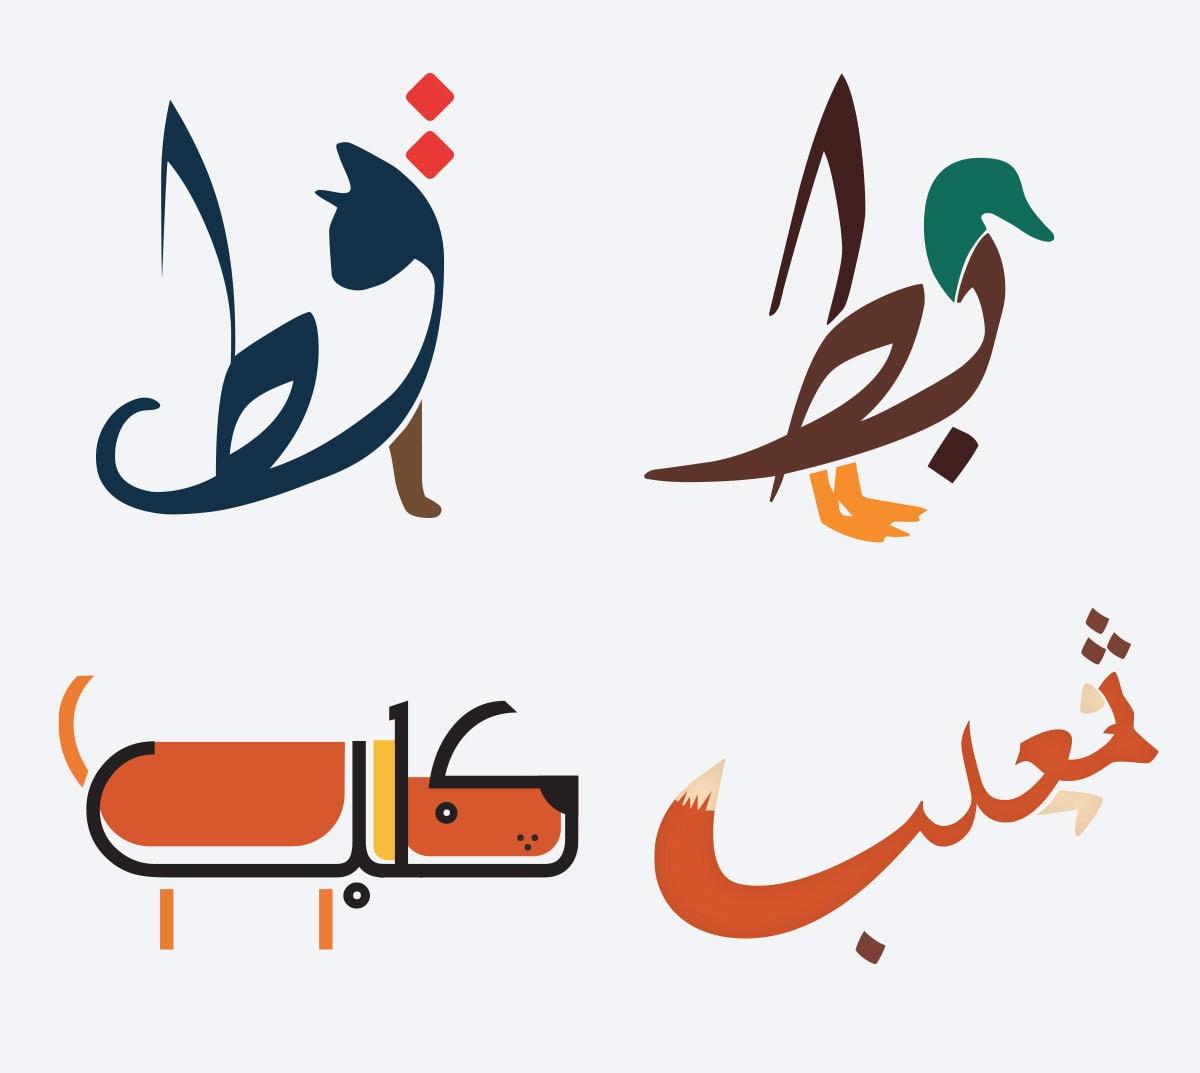 Mahmoud Tammam Illustrierte Sprache